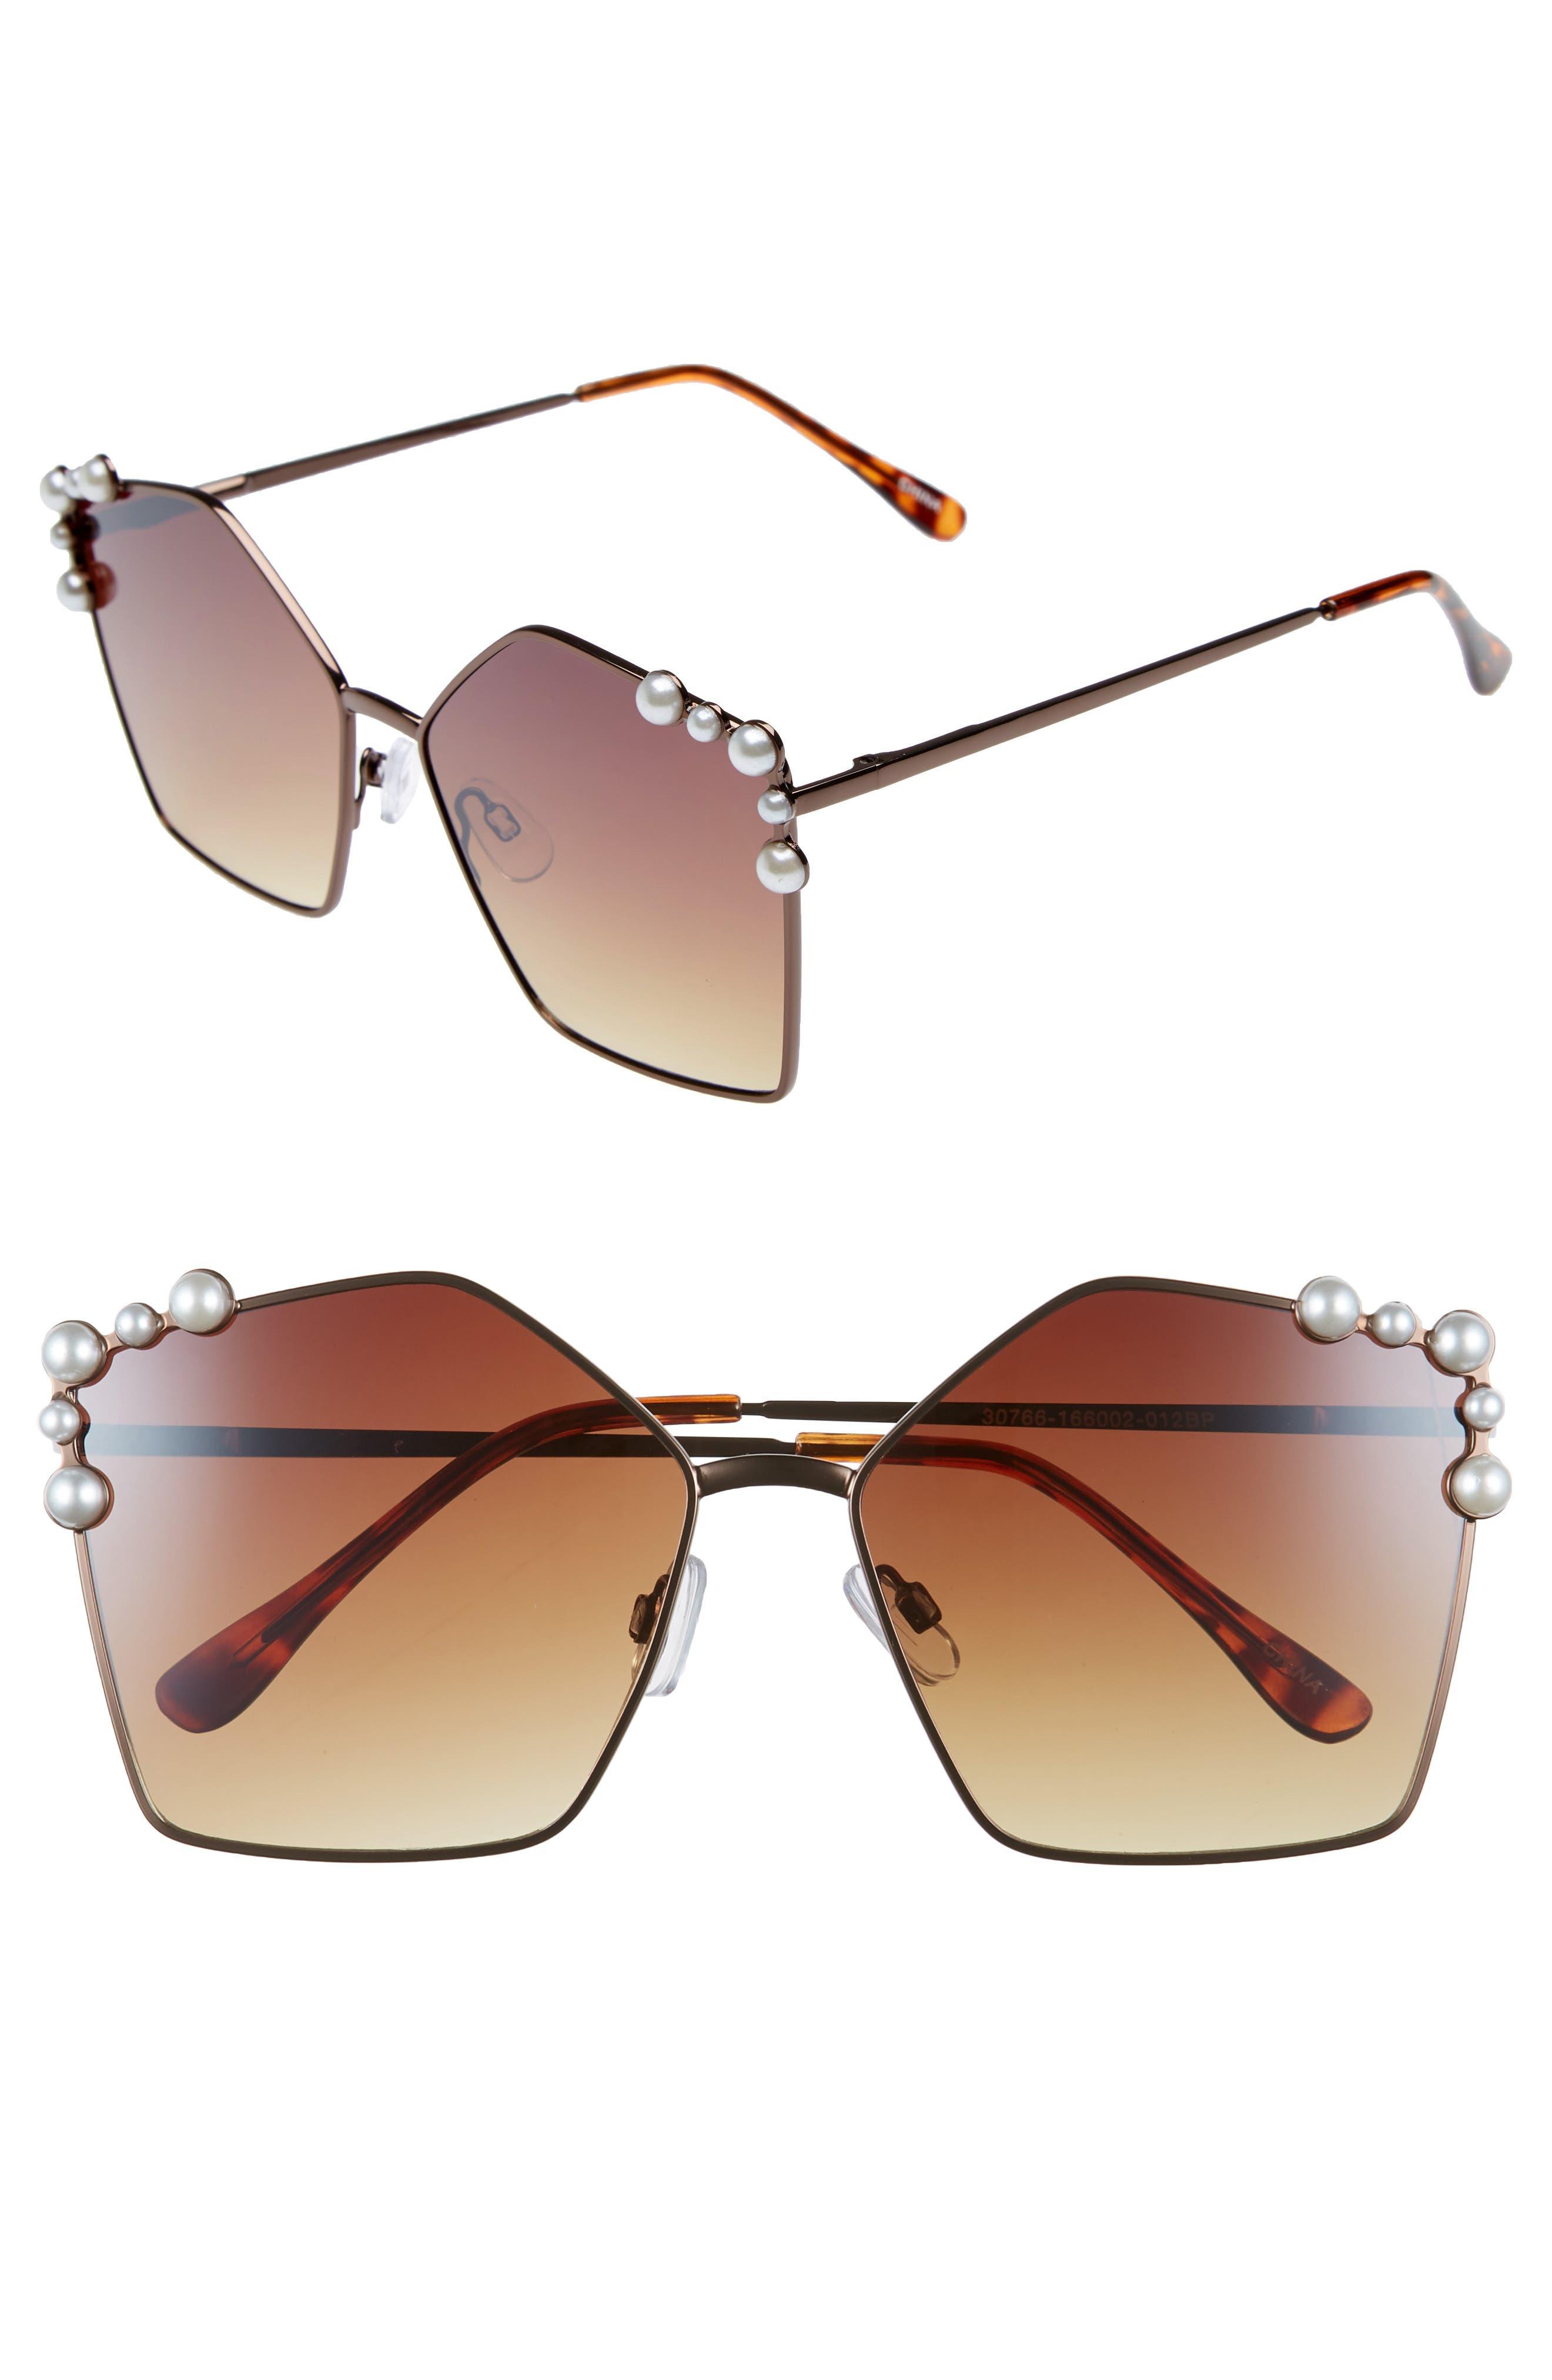 60mm Imitation Pearl Geometric Sunglasses,                             Main thumbnail 1, color,                             Brown/ Brown